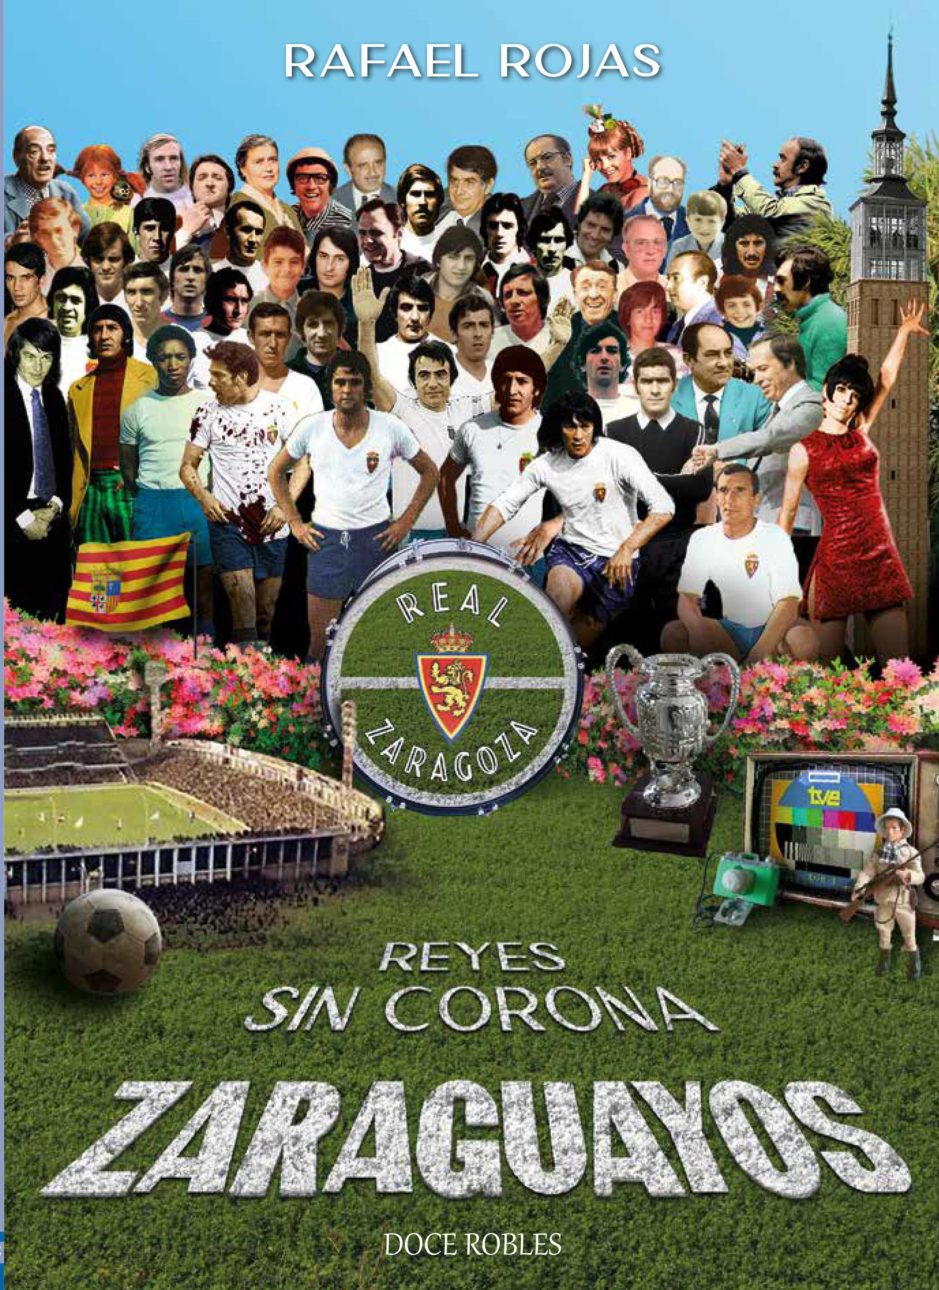 ZARAGUAYOS.